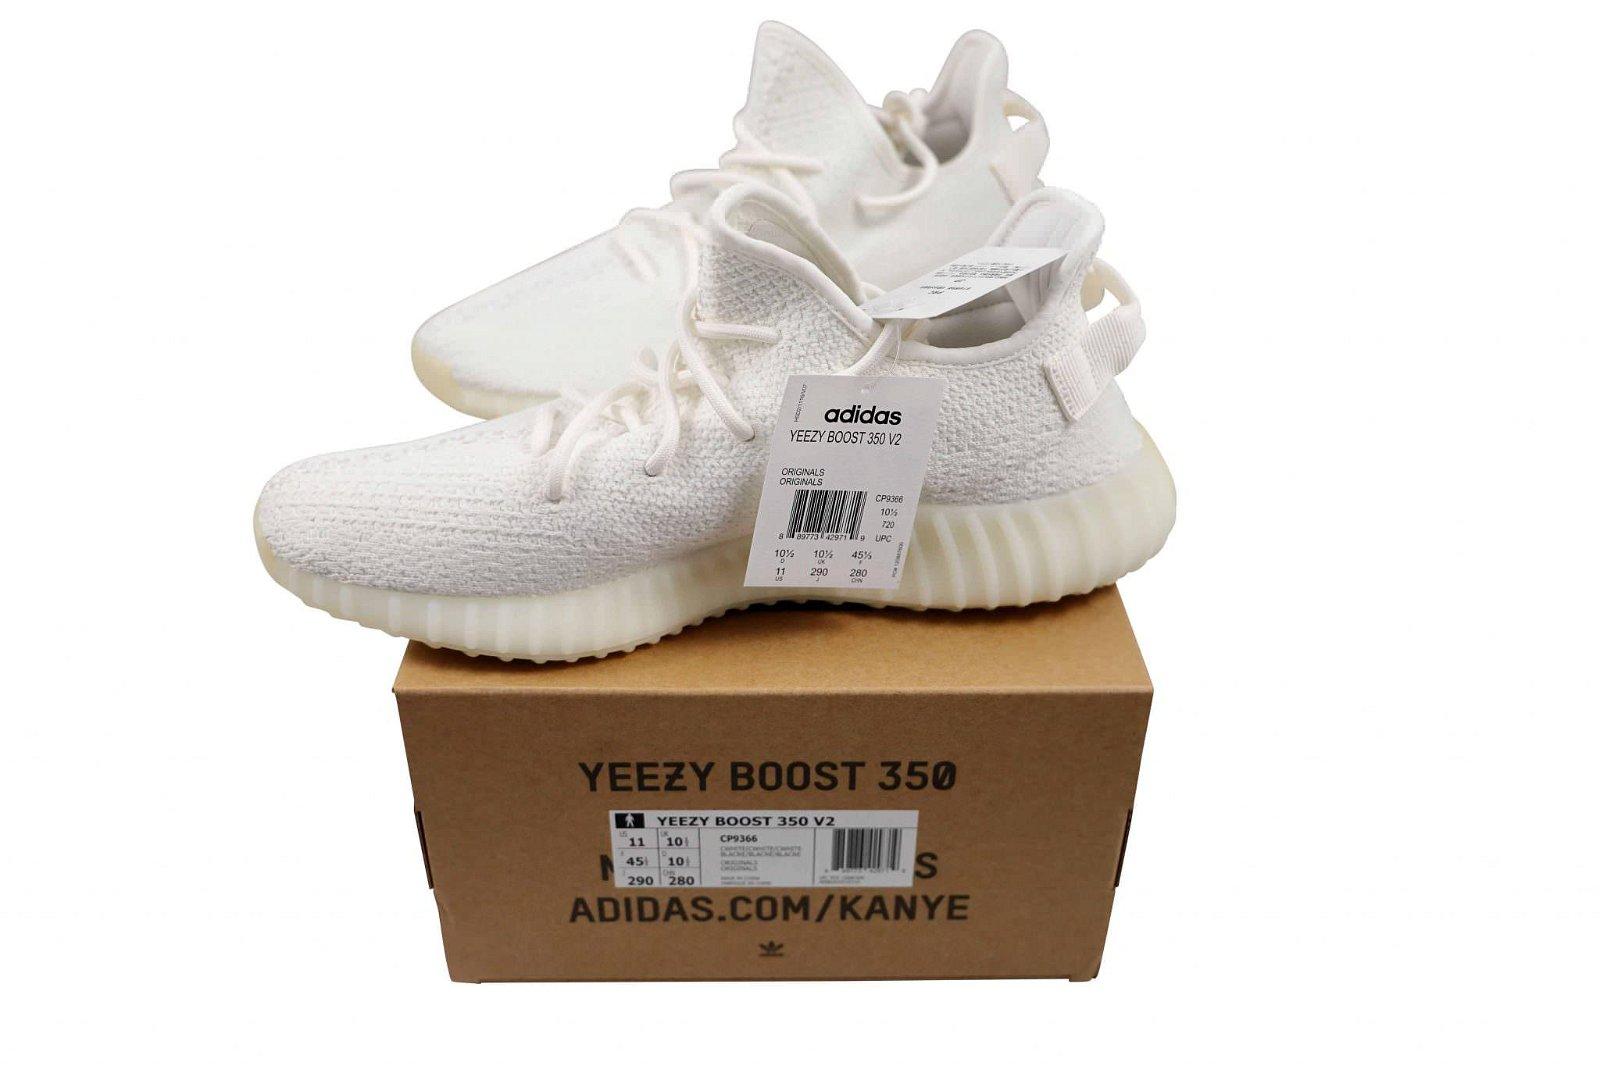 Adidas Yeezy Boost 350 V2 White Cream-Triple Size 11